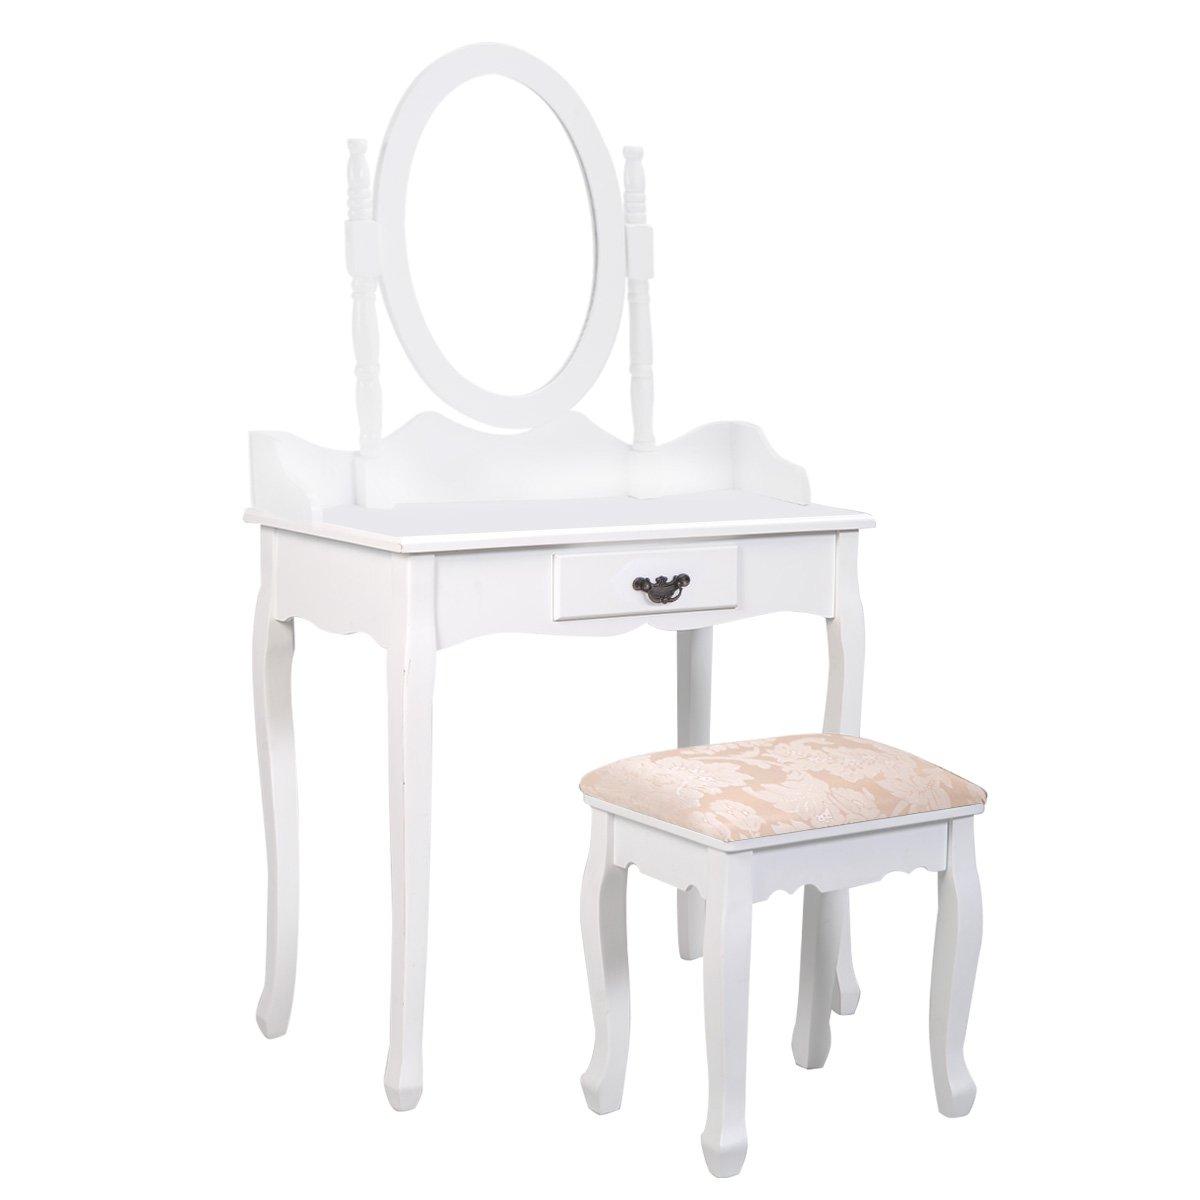 Giantex Bathroom Vanity Table Set w/Mirror Cushioned Stool Makeup Dressing Table Set w/ 1 Drawer Wood Jewelry Cosmetics Organizer Dresser Writing Desk Easy Assembly